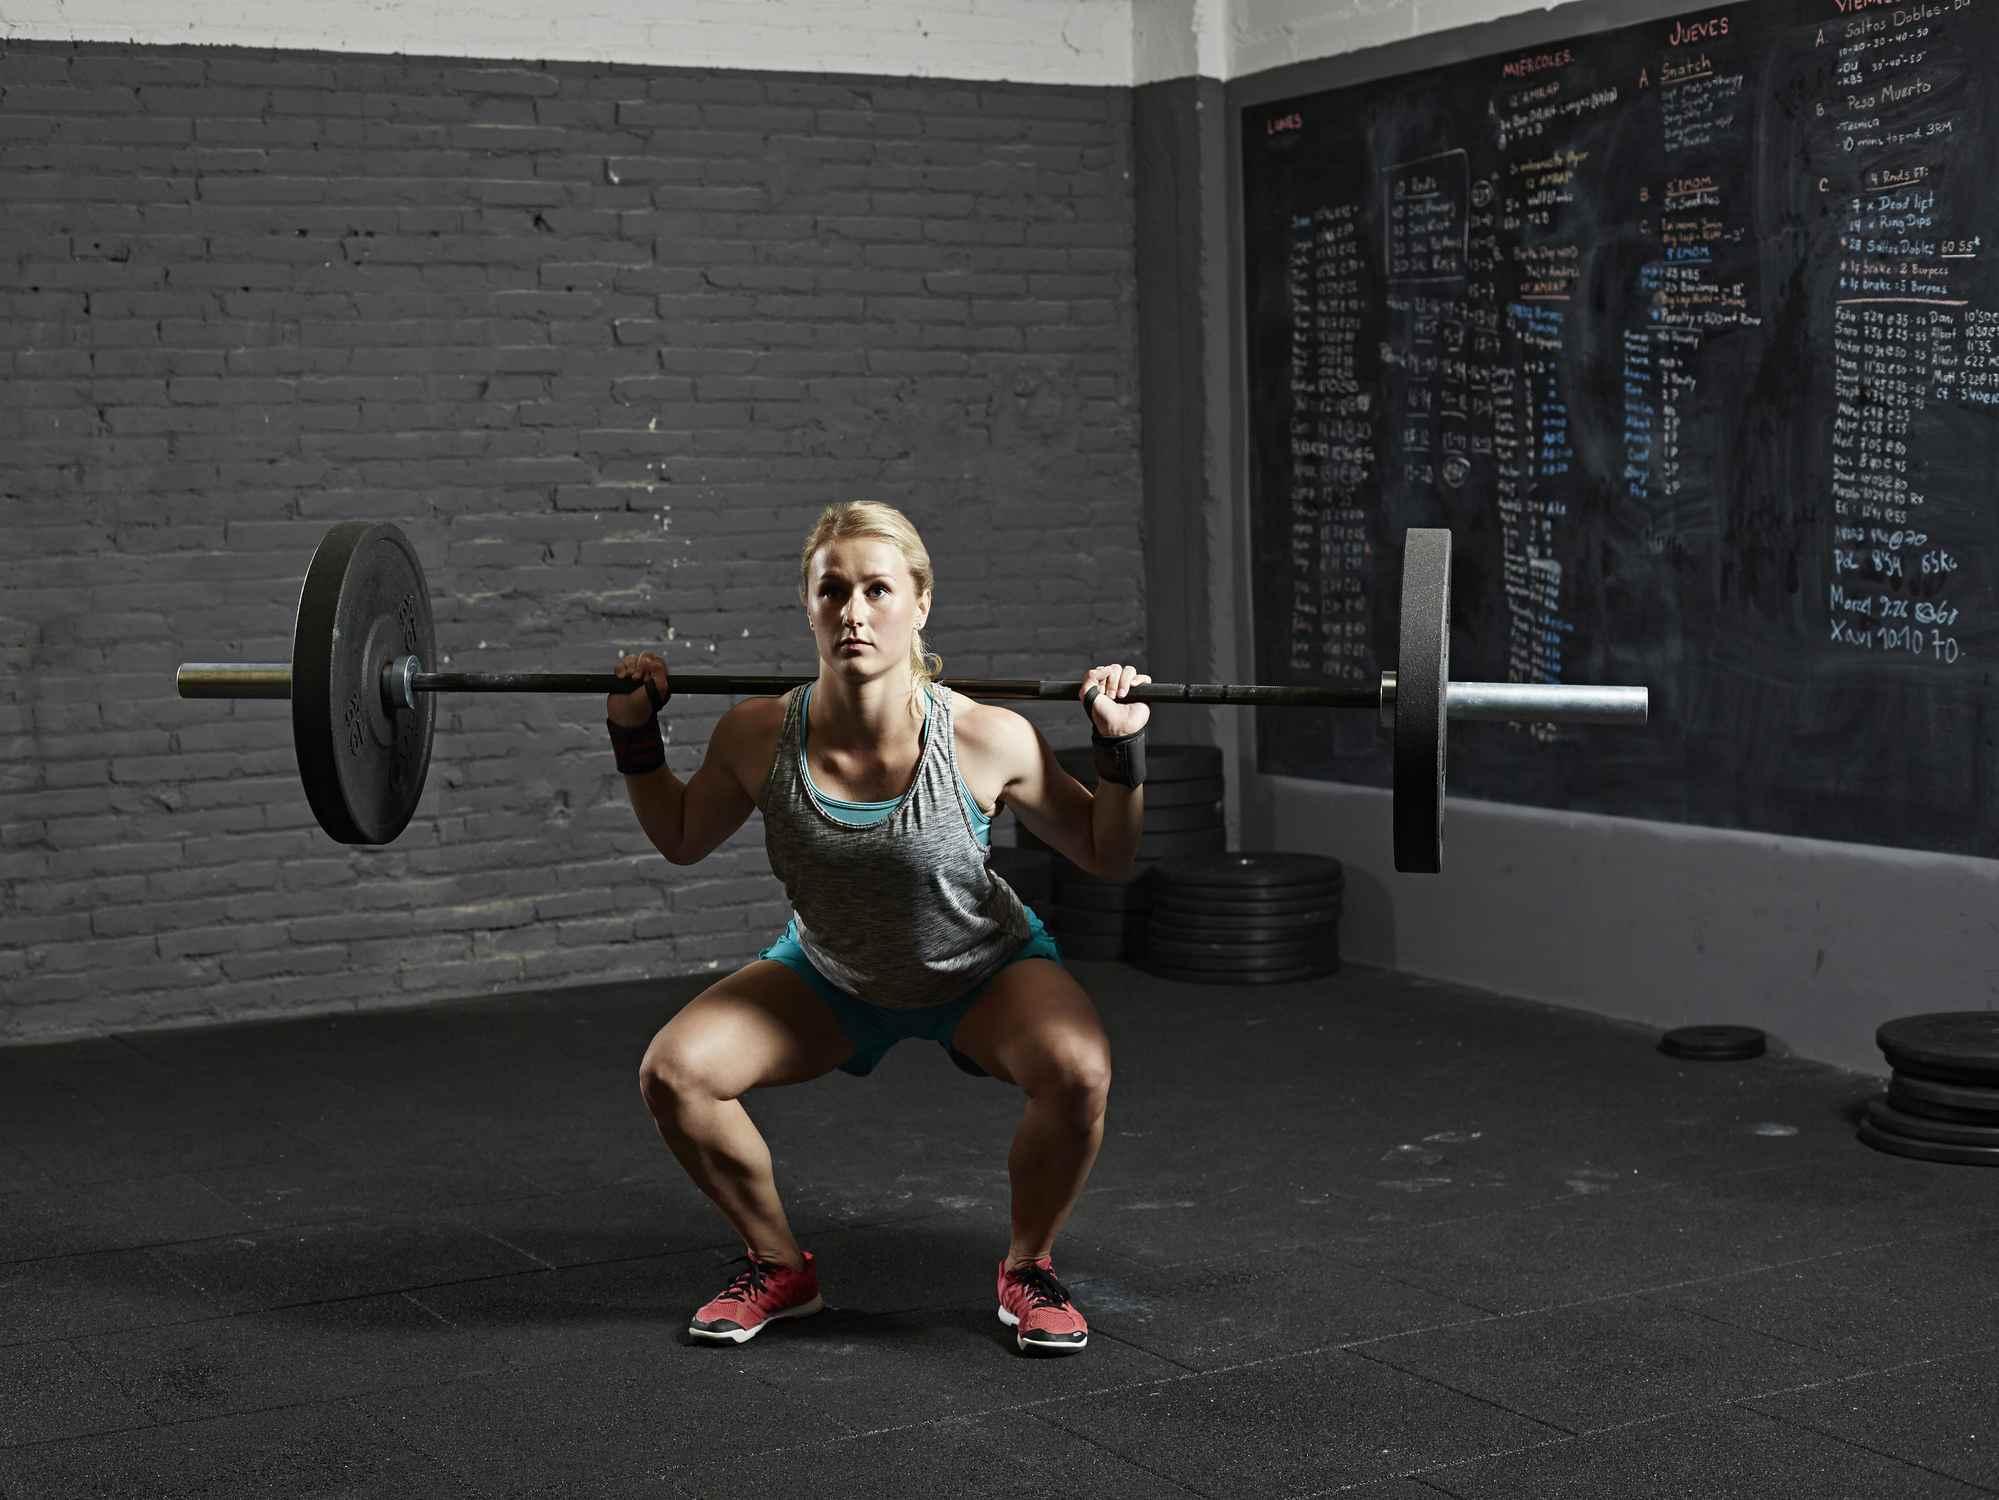 Female gym performing back squat